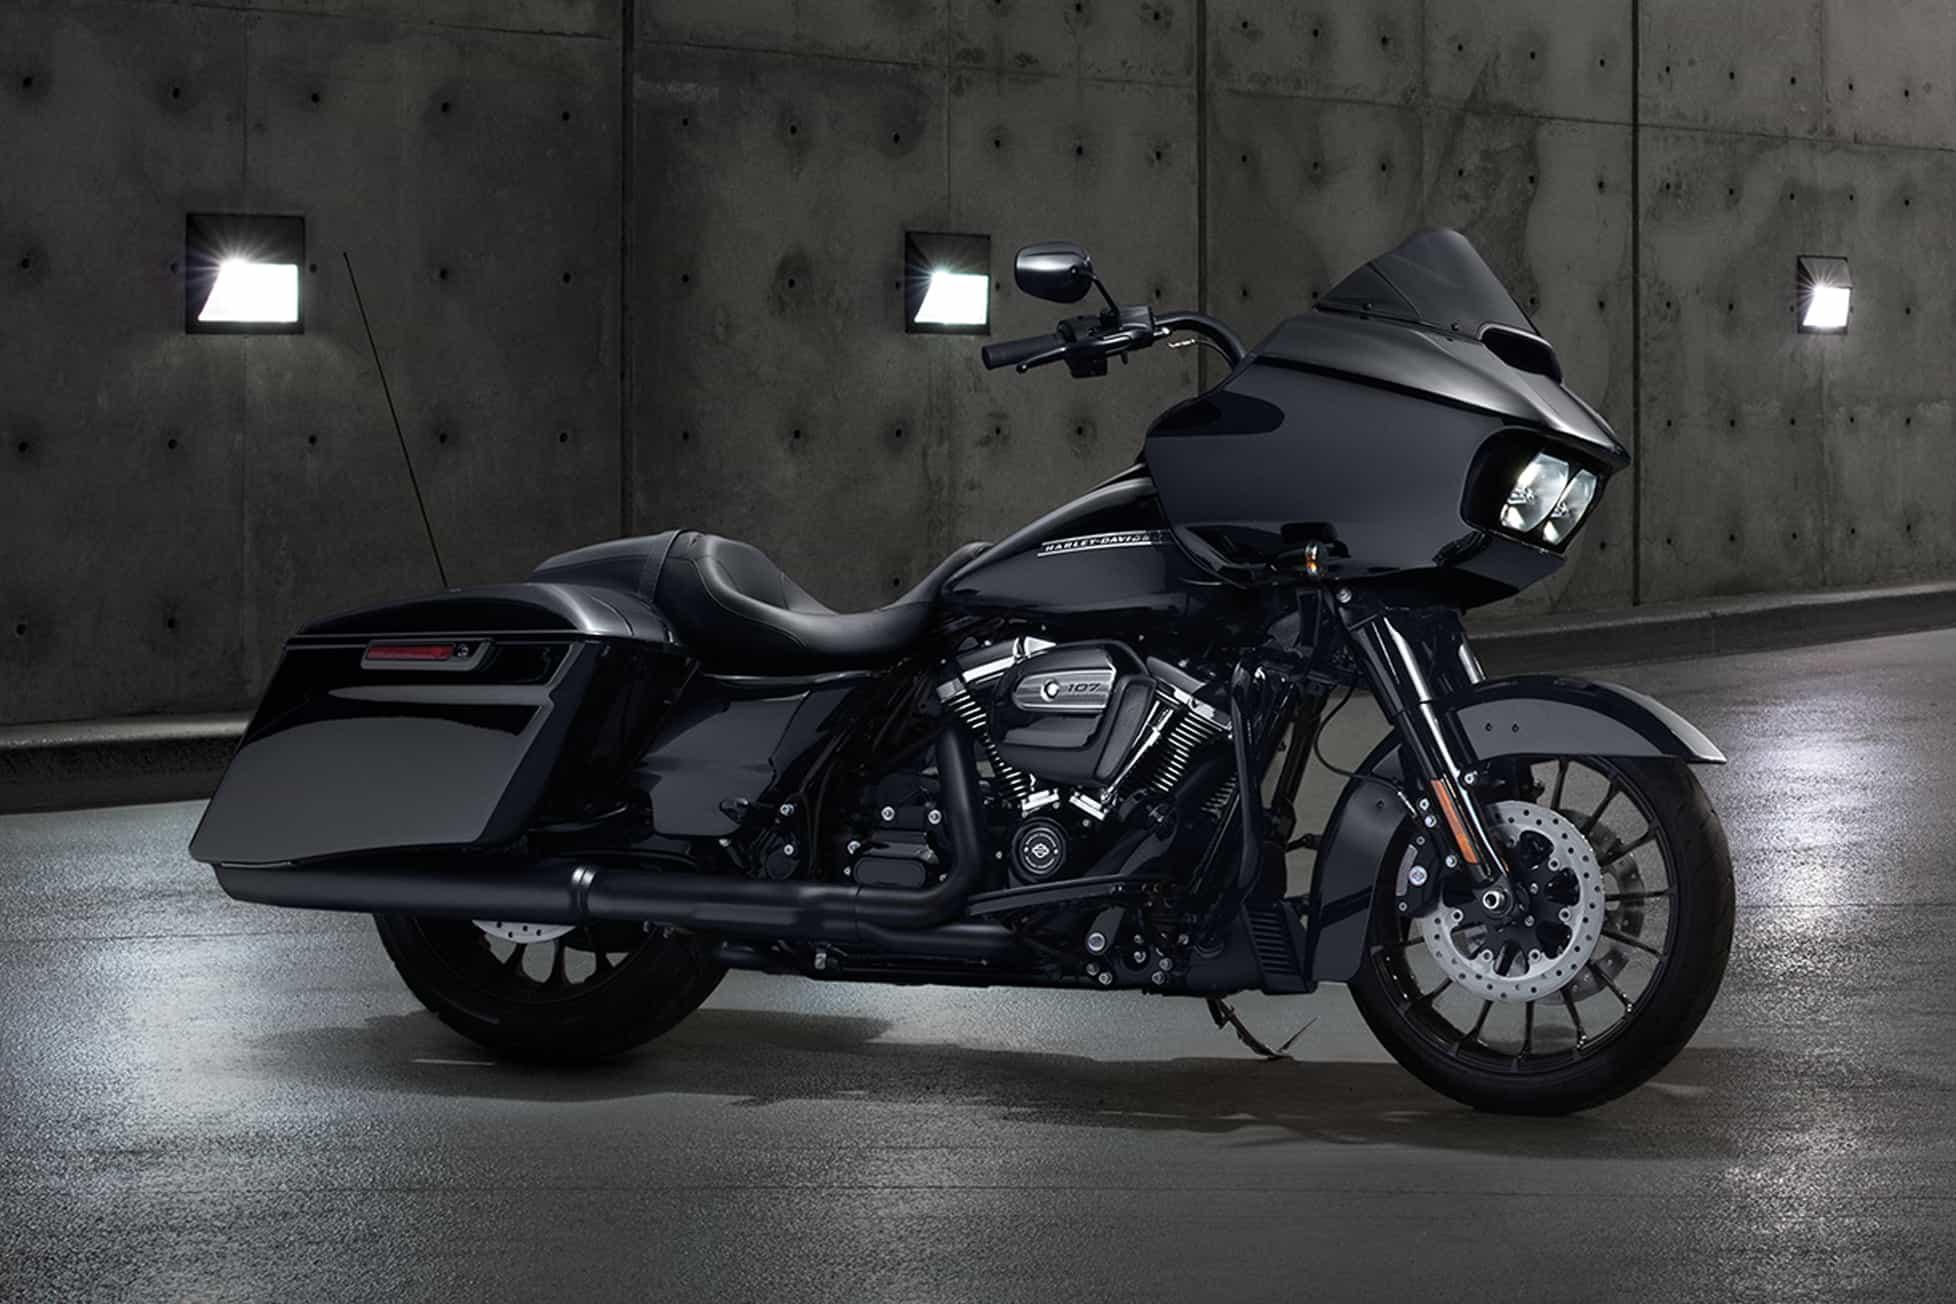 Harley Davidson Motorcycle Class Orlando